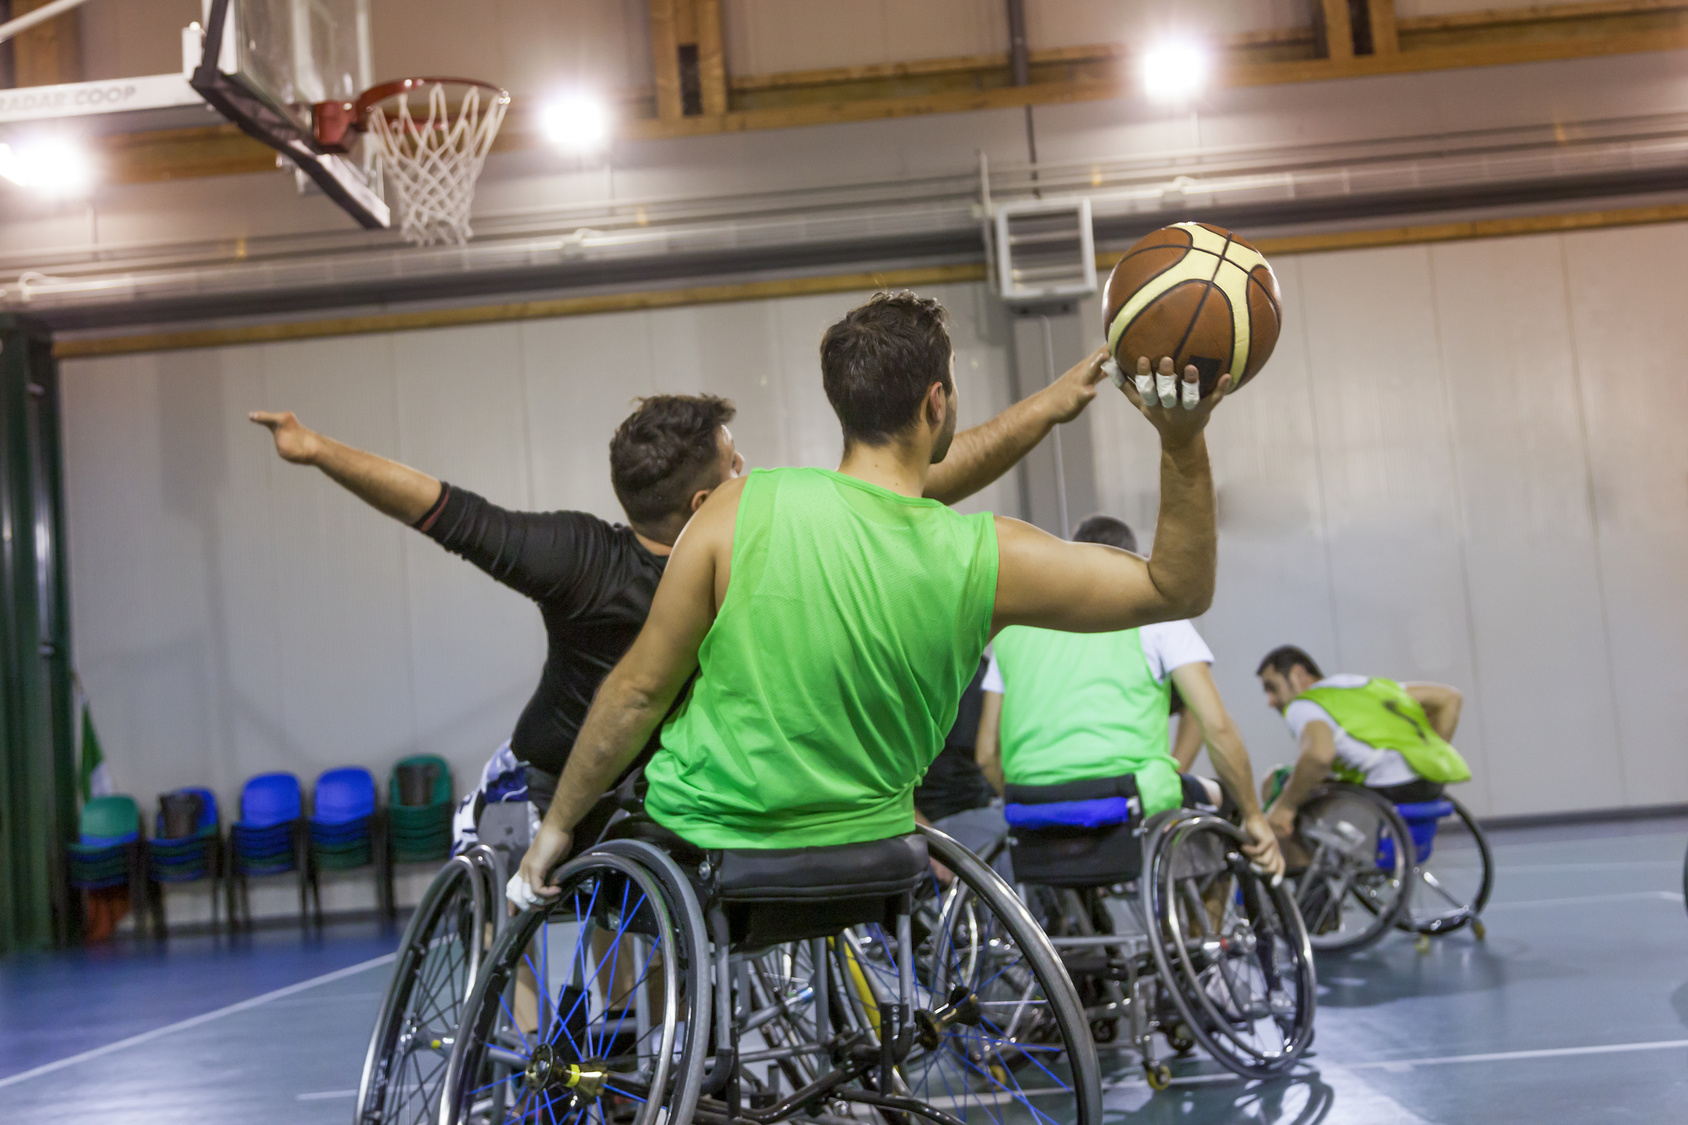 Zwei Mannnschaften spielen Rollstuhl Basketball gegeneinander